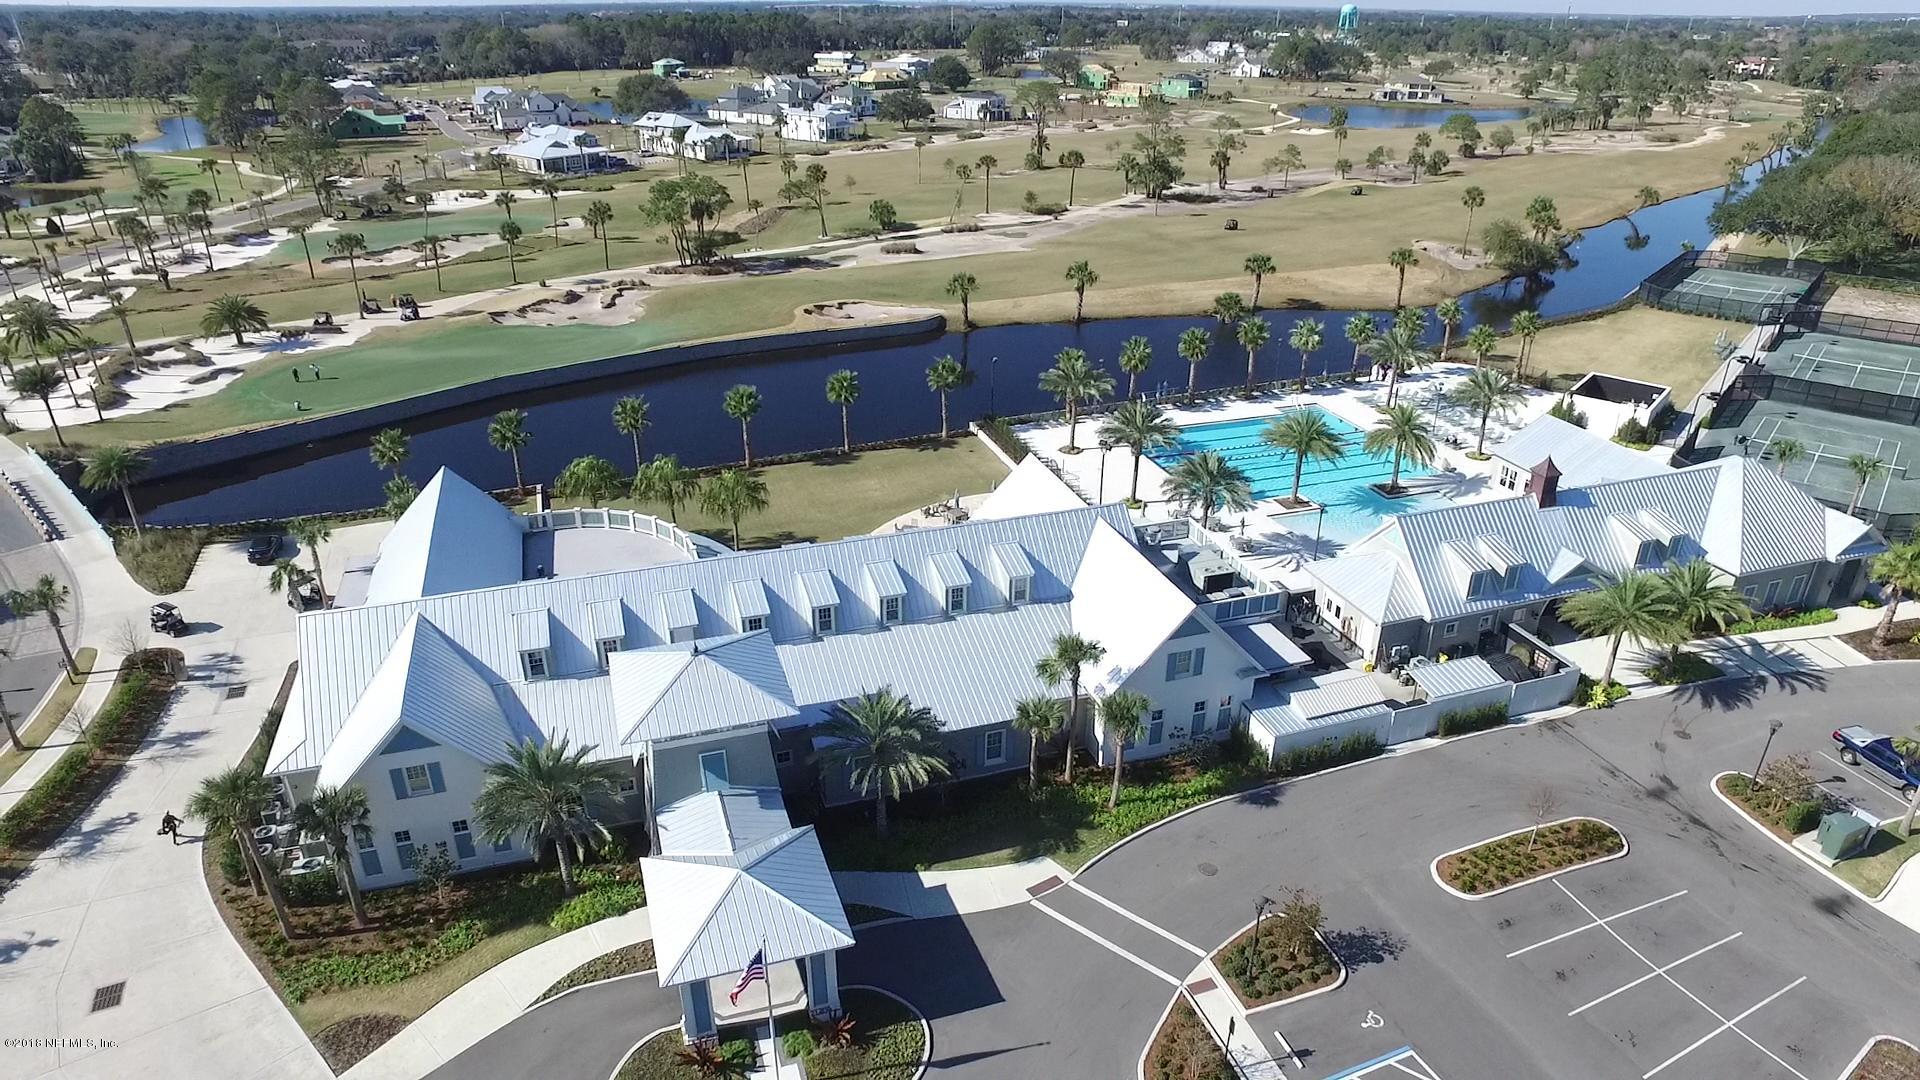 587 TIMBER BRIDGE, ATLANTIC BEACH, FLORIDA 32233, ,Vacant land,For sale,TIMBER BRIDGE,922981